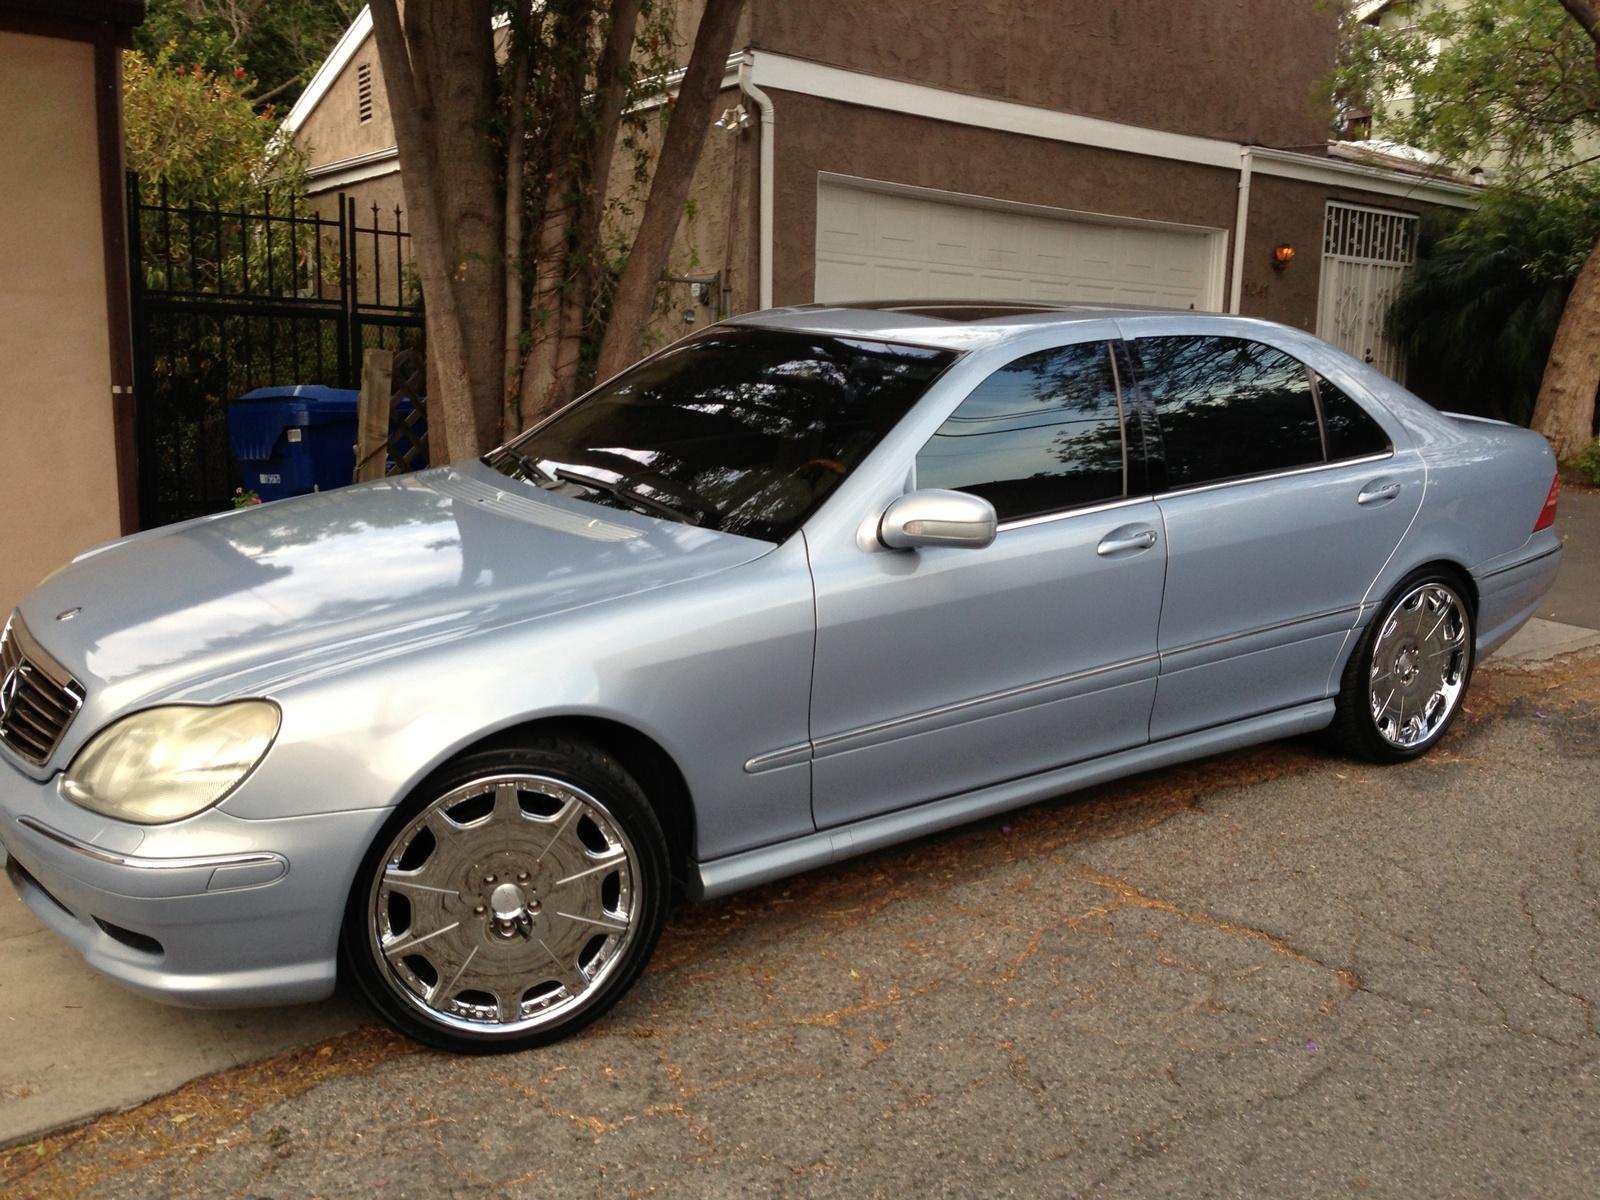 2001 Mercedes-Benz S-Class - Exterior Pictures - CarGurus